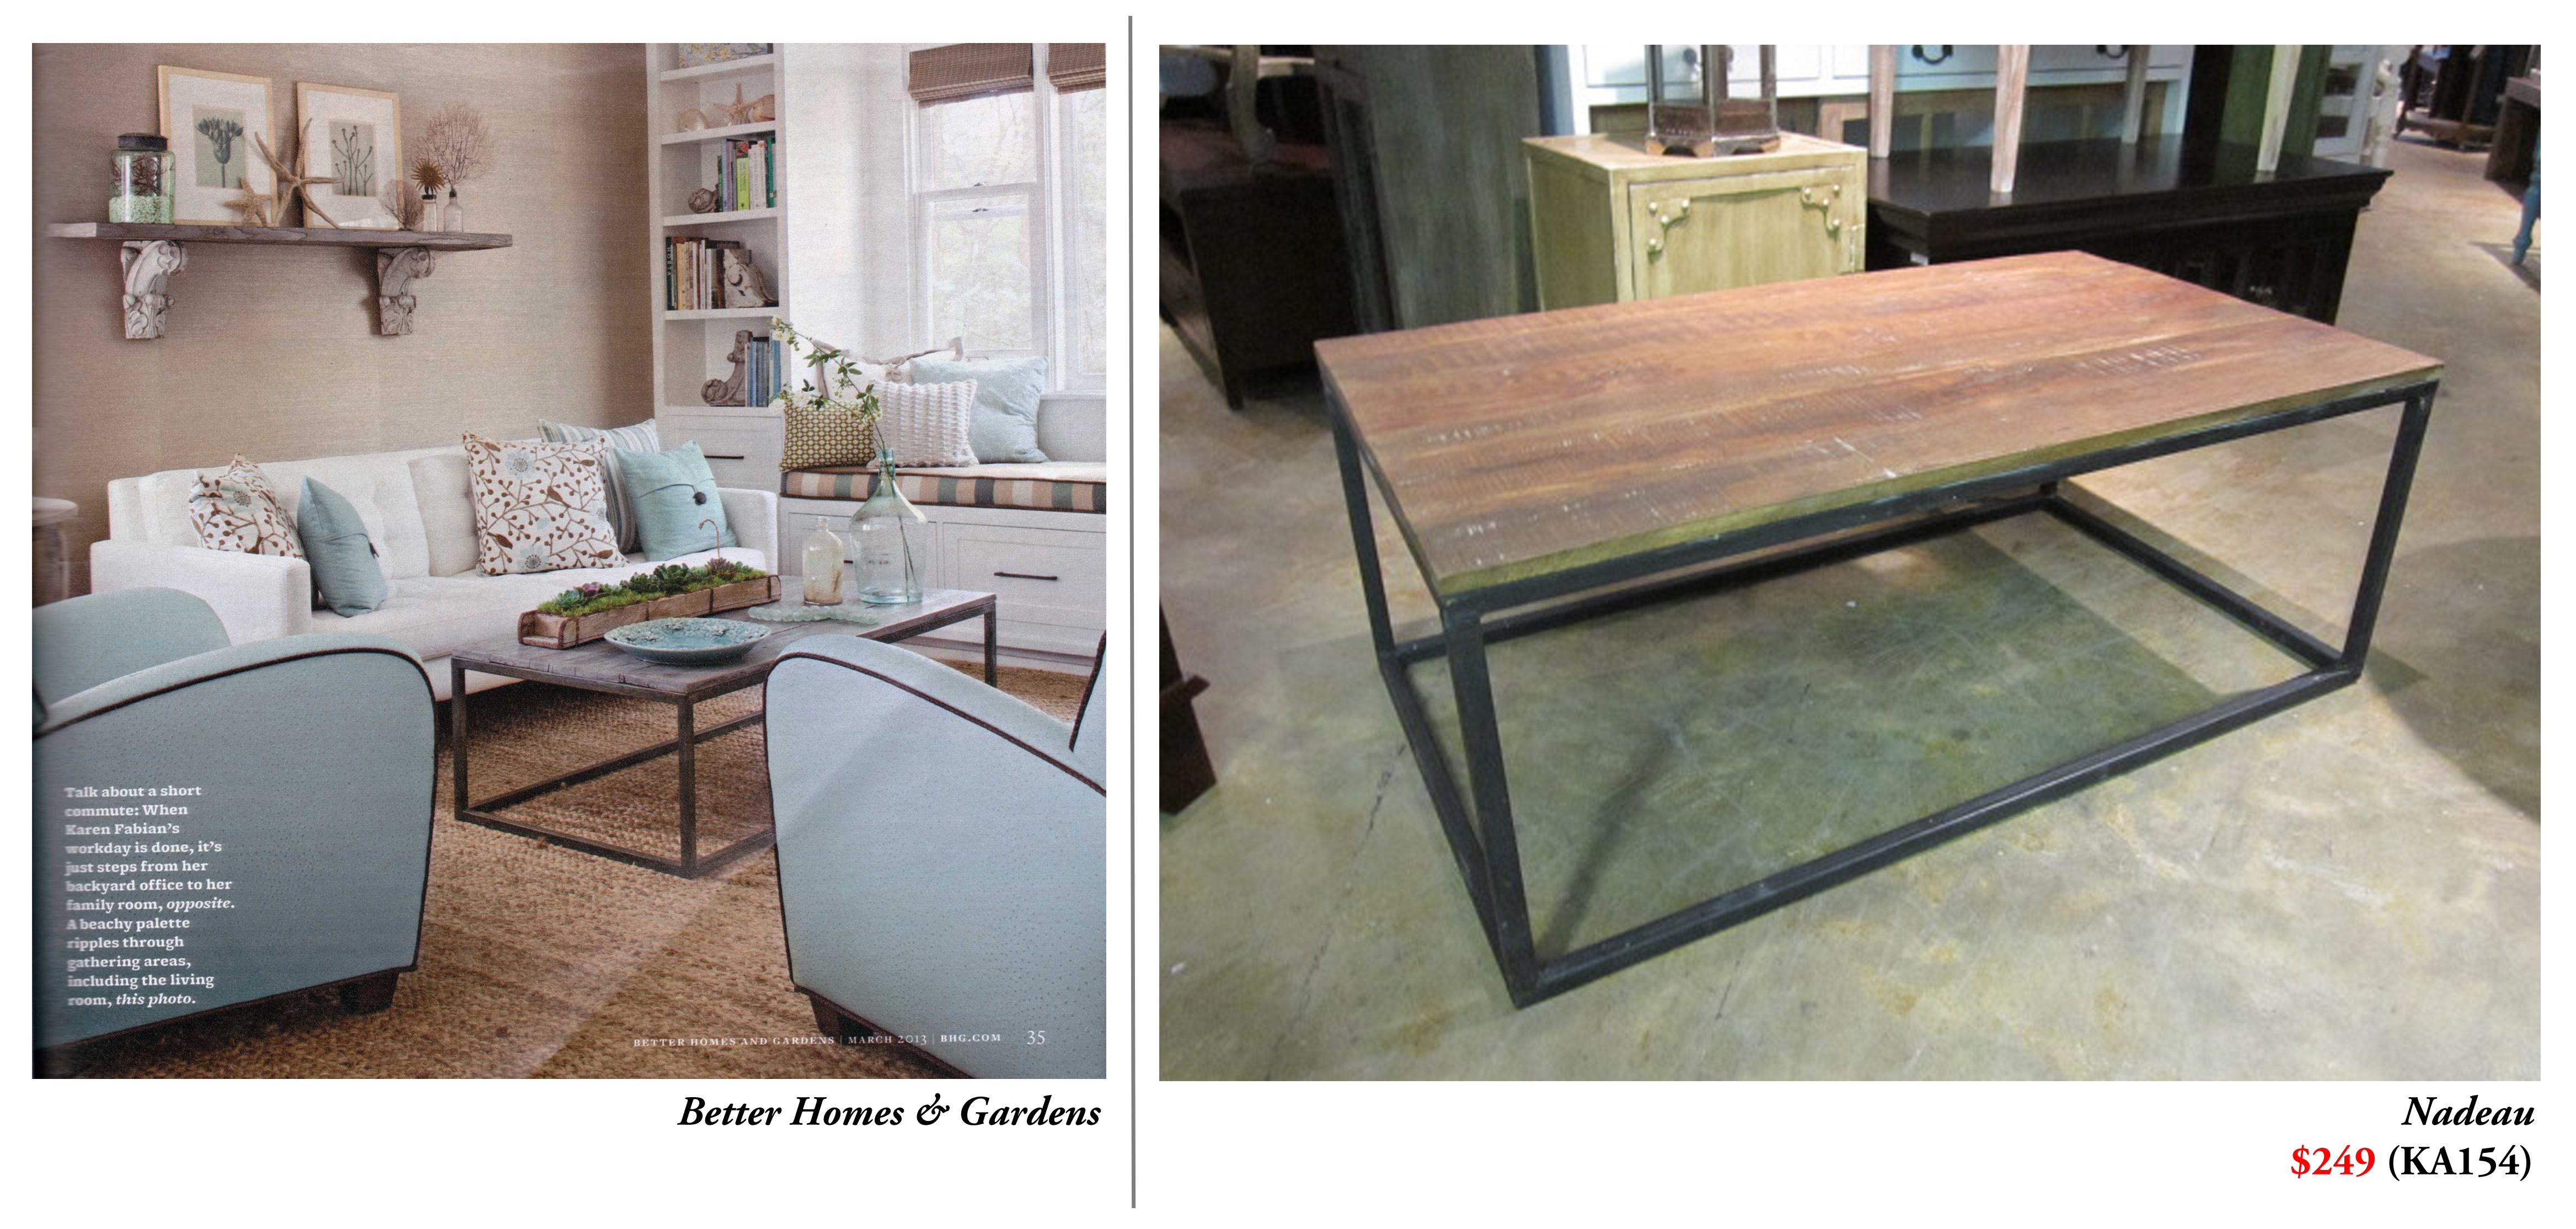 Metal Wood Coffee Table In Better Homes Gardens Ka154 249 Nadeau Furniturewithasoul Coffee Table Wood Metal Wood Coffee Table Coffee Table [ 2228 x 4671 Pixel ]